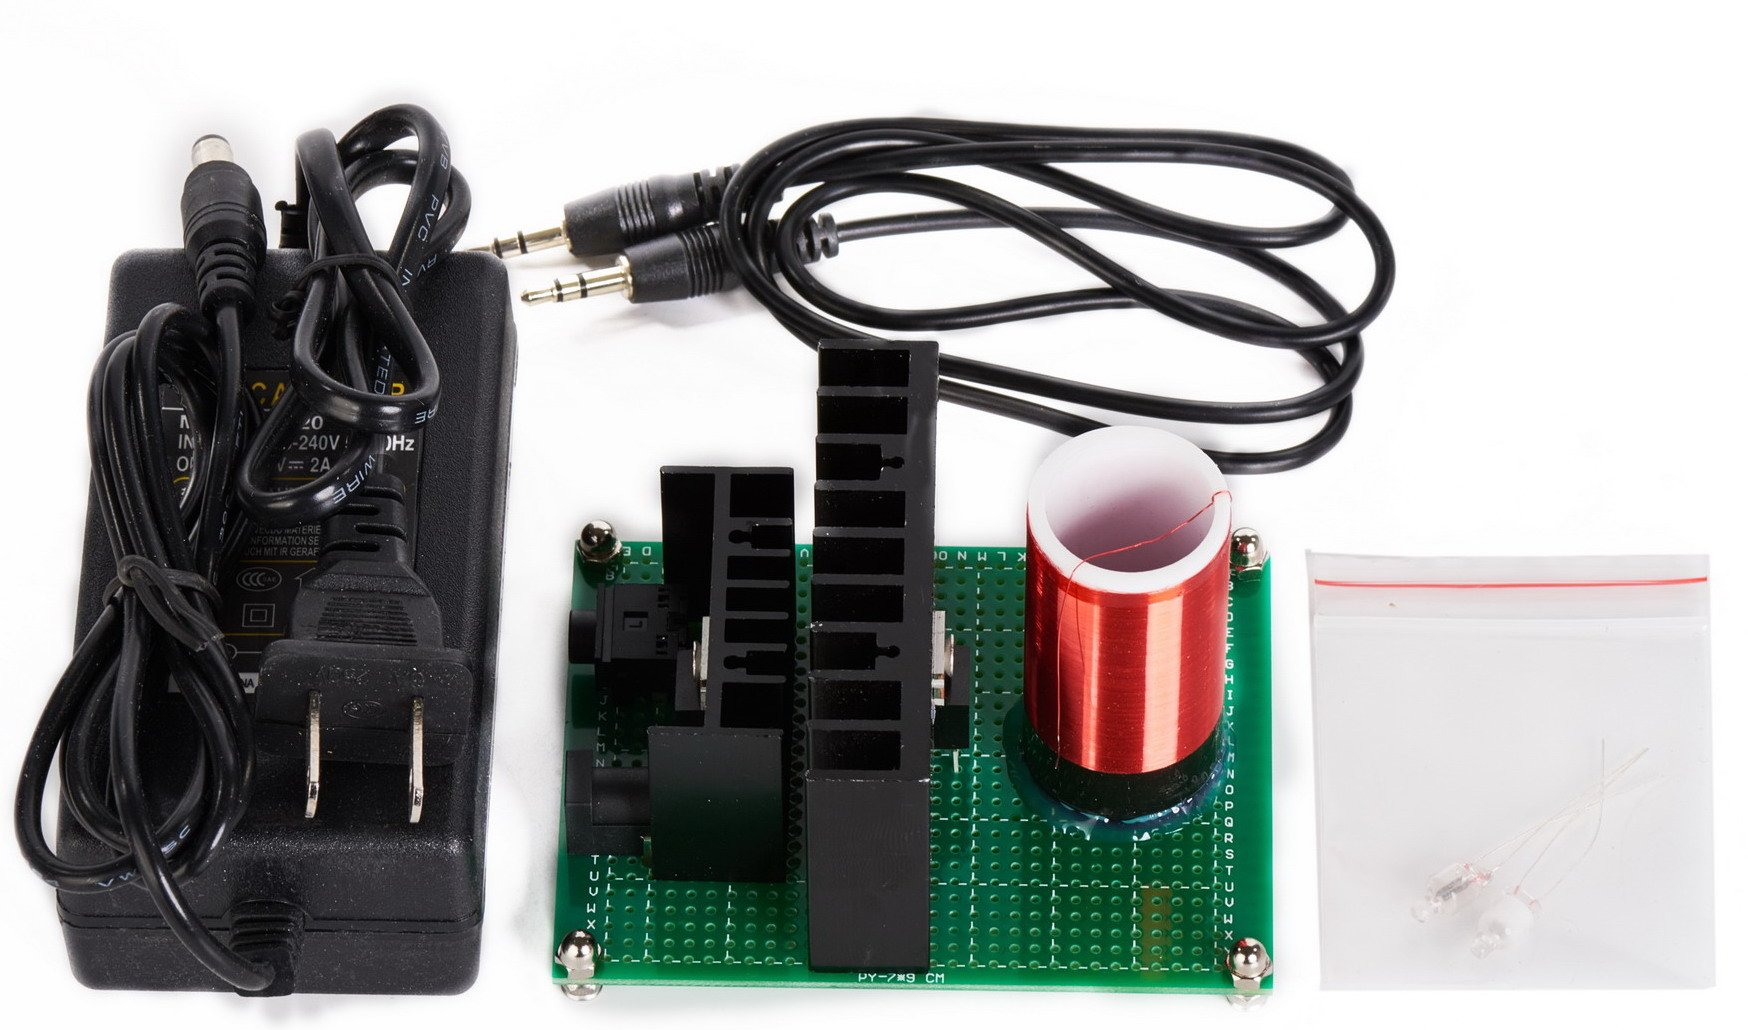 Sunnytech® Tesla Coil Super Mini Tesla's Coil Model (Tesla Loudspeaker) M072